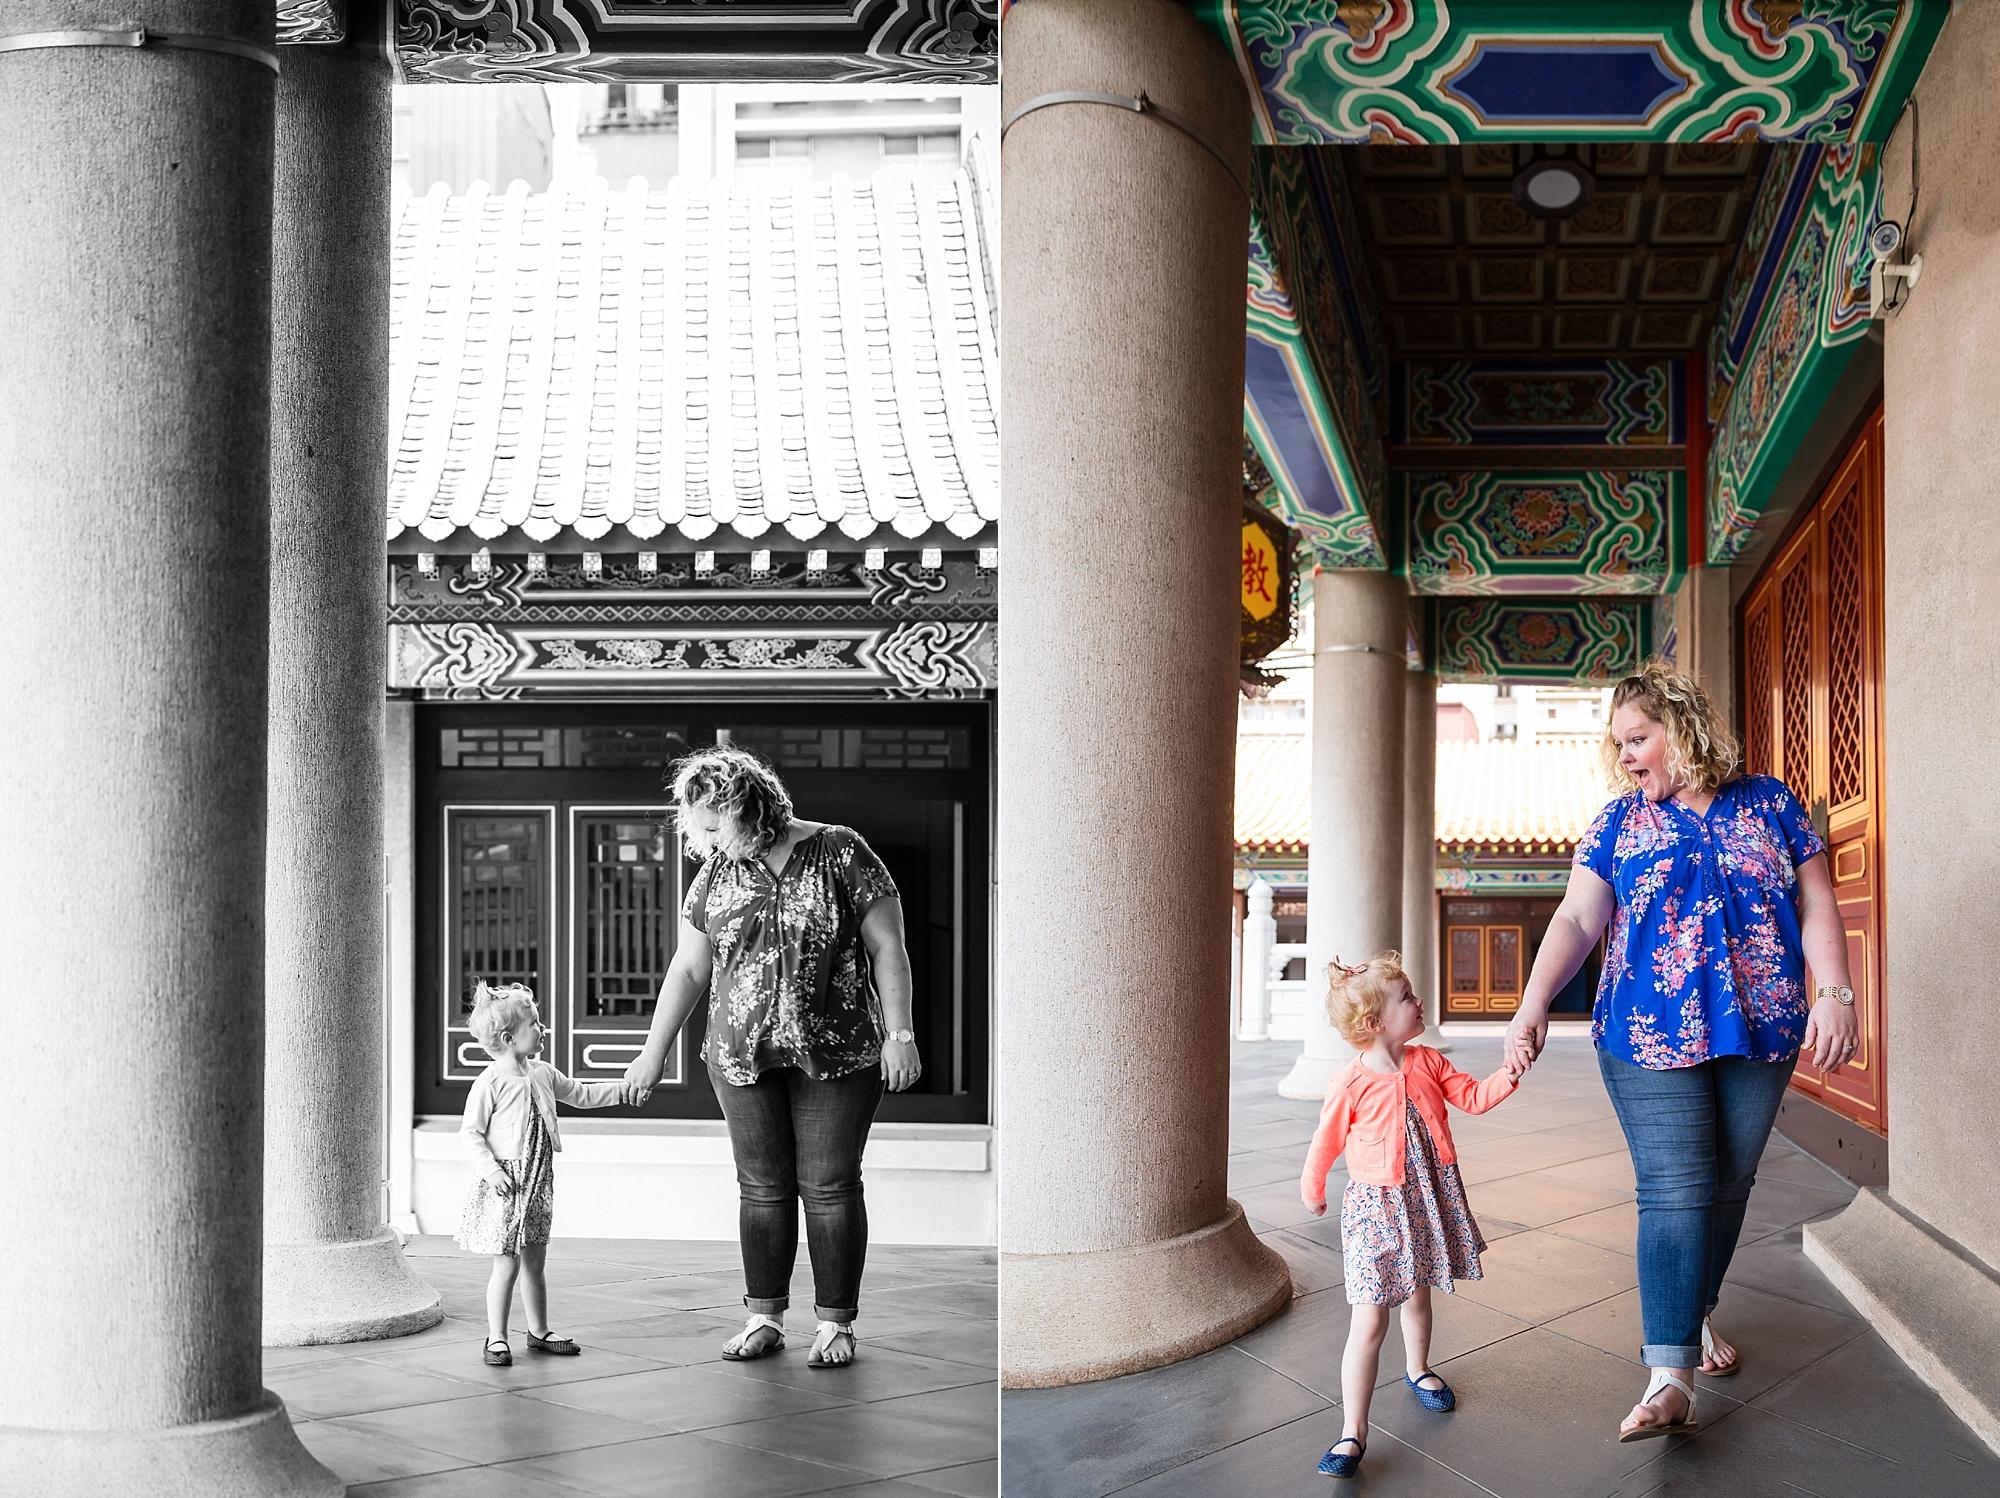 Outdoor_Lifestyle_Family_Photos_Taiwan_Hunnicutt_Photography_0010